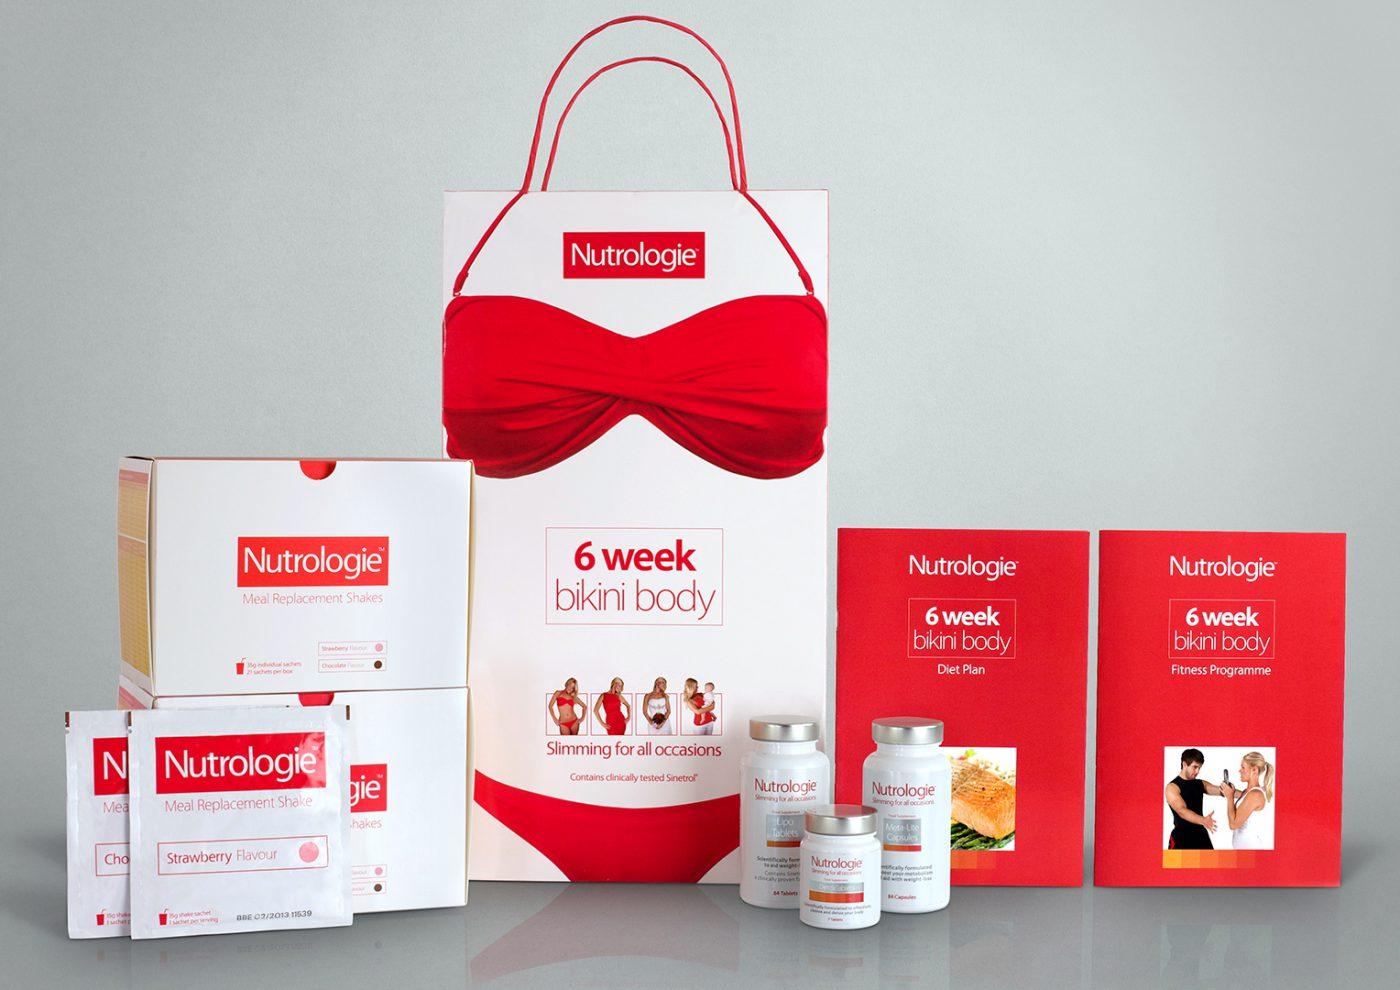 Nutrologie. Packaging. Creative artwork and graphic design.